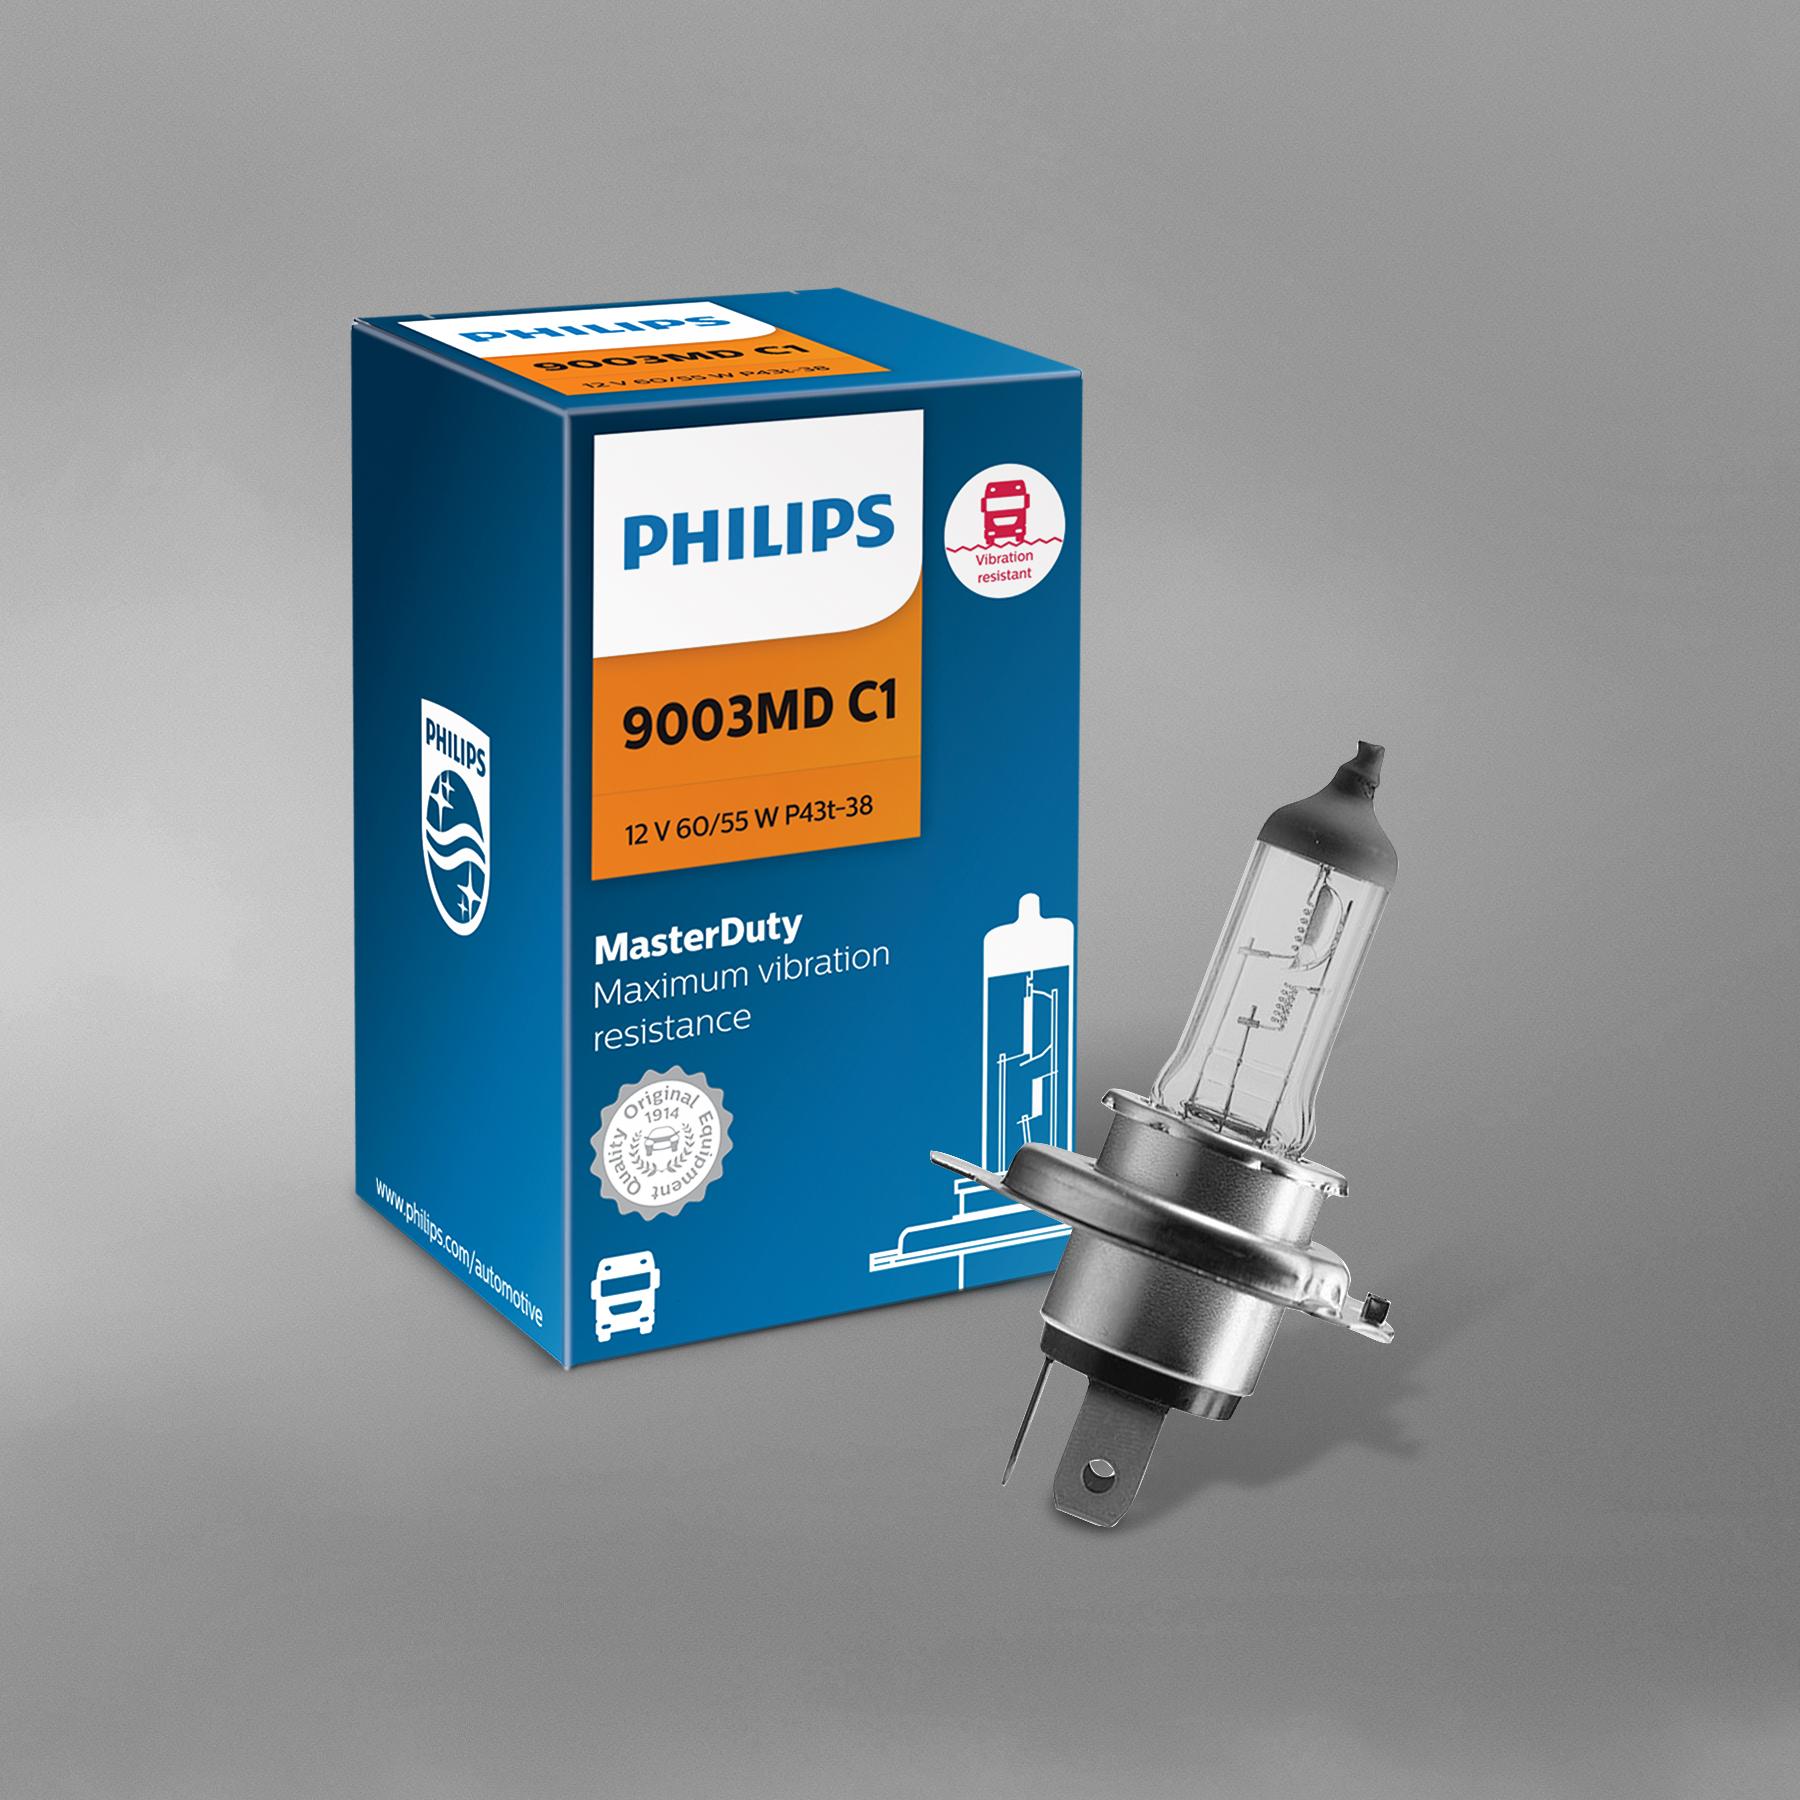 Lumileds Offers Philips MasterDuty Headlight Bulbs